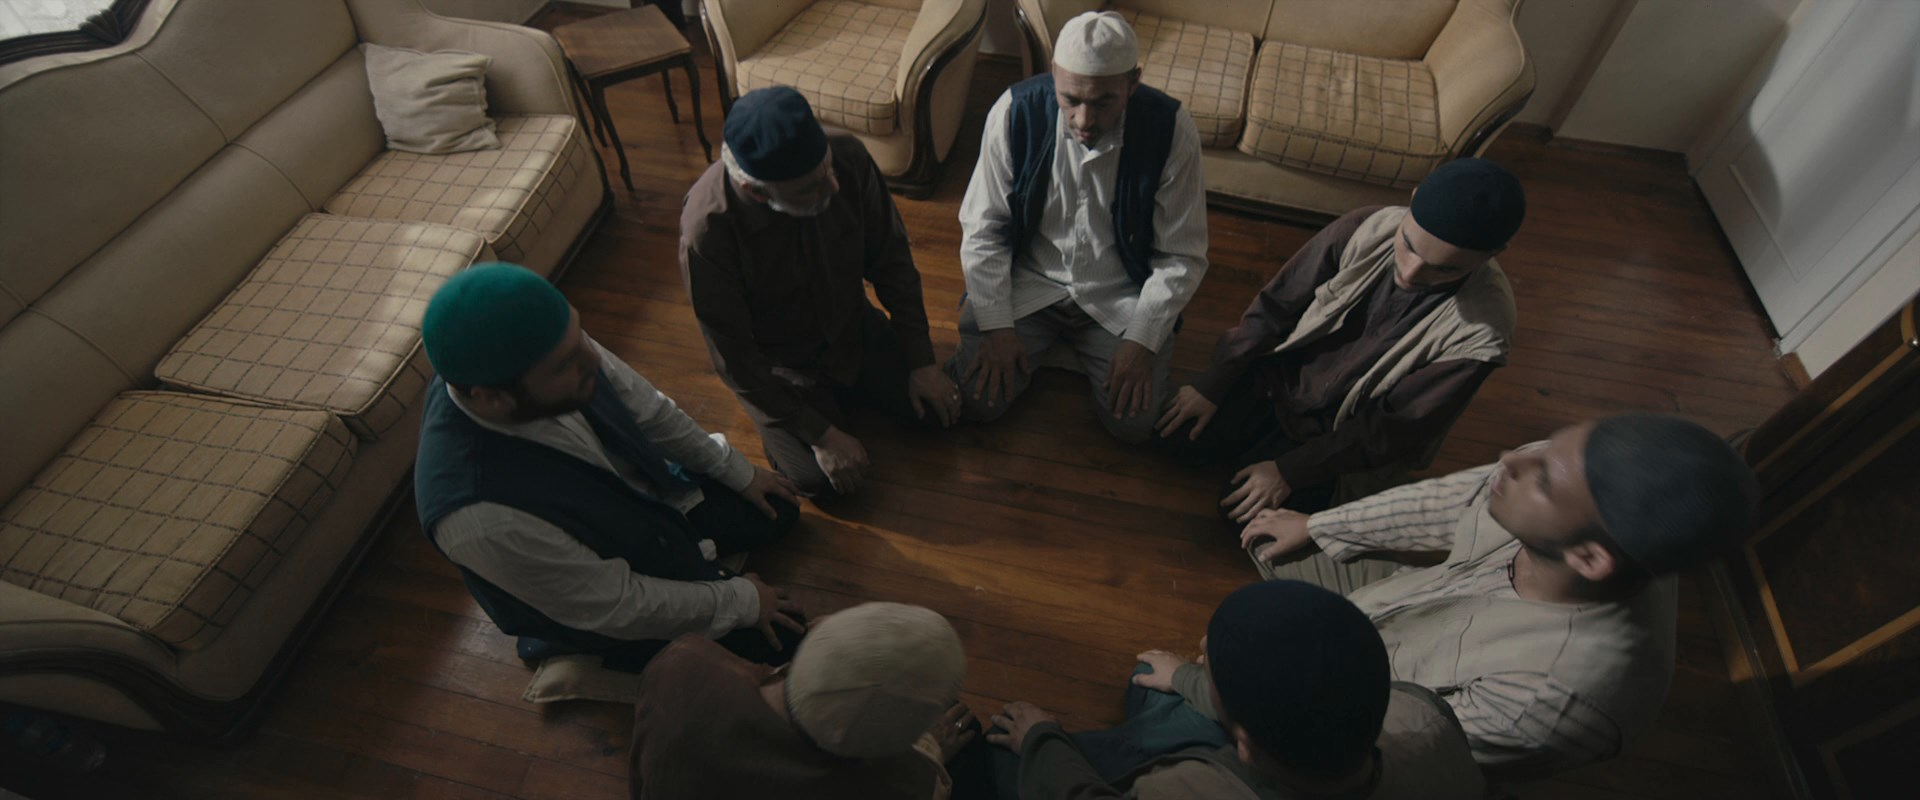 Sir-Ayet 2 | 2019 | Yerli Film | AMZN | WEB-DL | XviD | Sansürsüz | 720p - 1080p - m720p - m1080p | WEB-DL | Tek Link